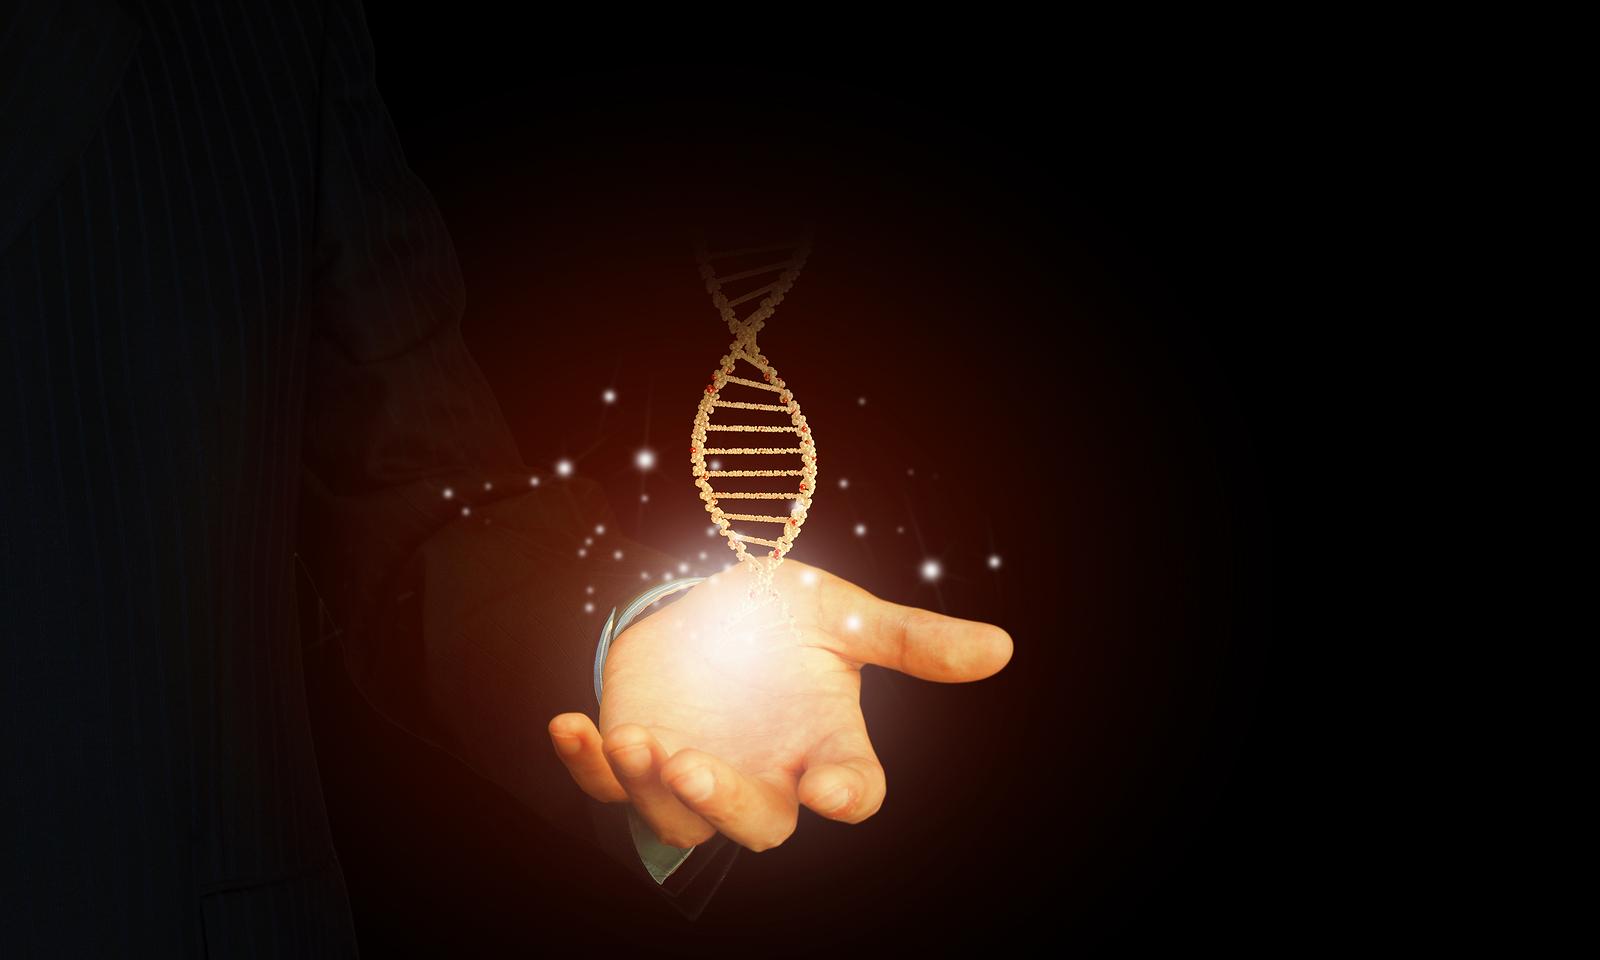 Turning Stem Cell Magic into Stem Cell Medicine